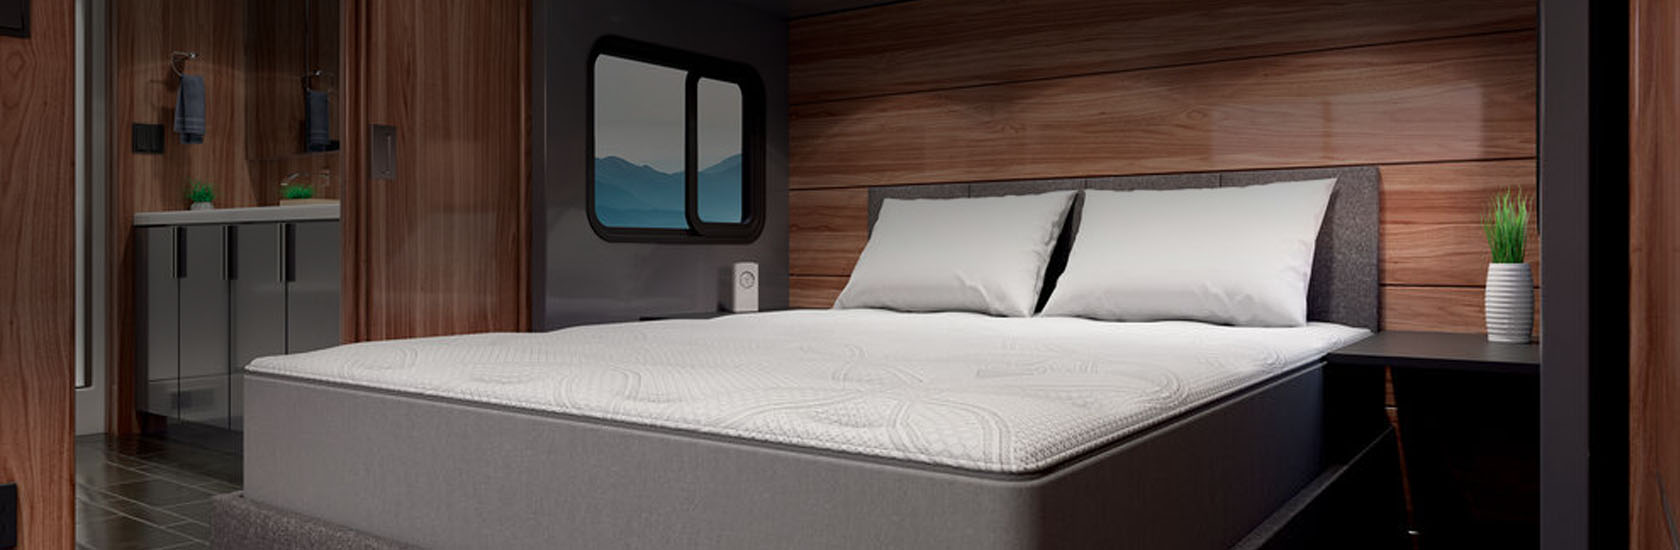 Exclusive Deals on RV Mattresses & Furniture